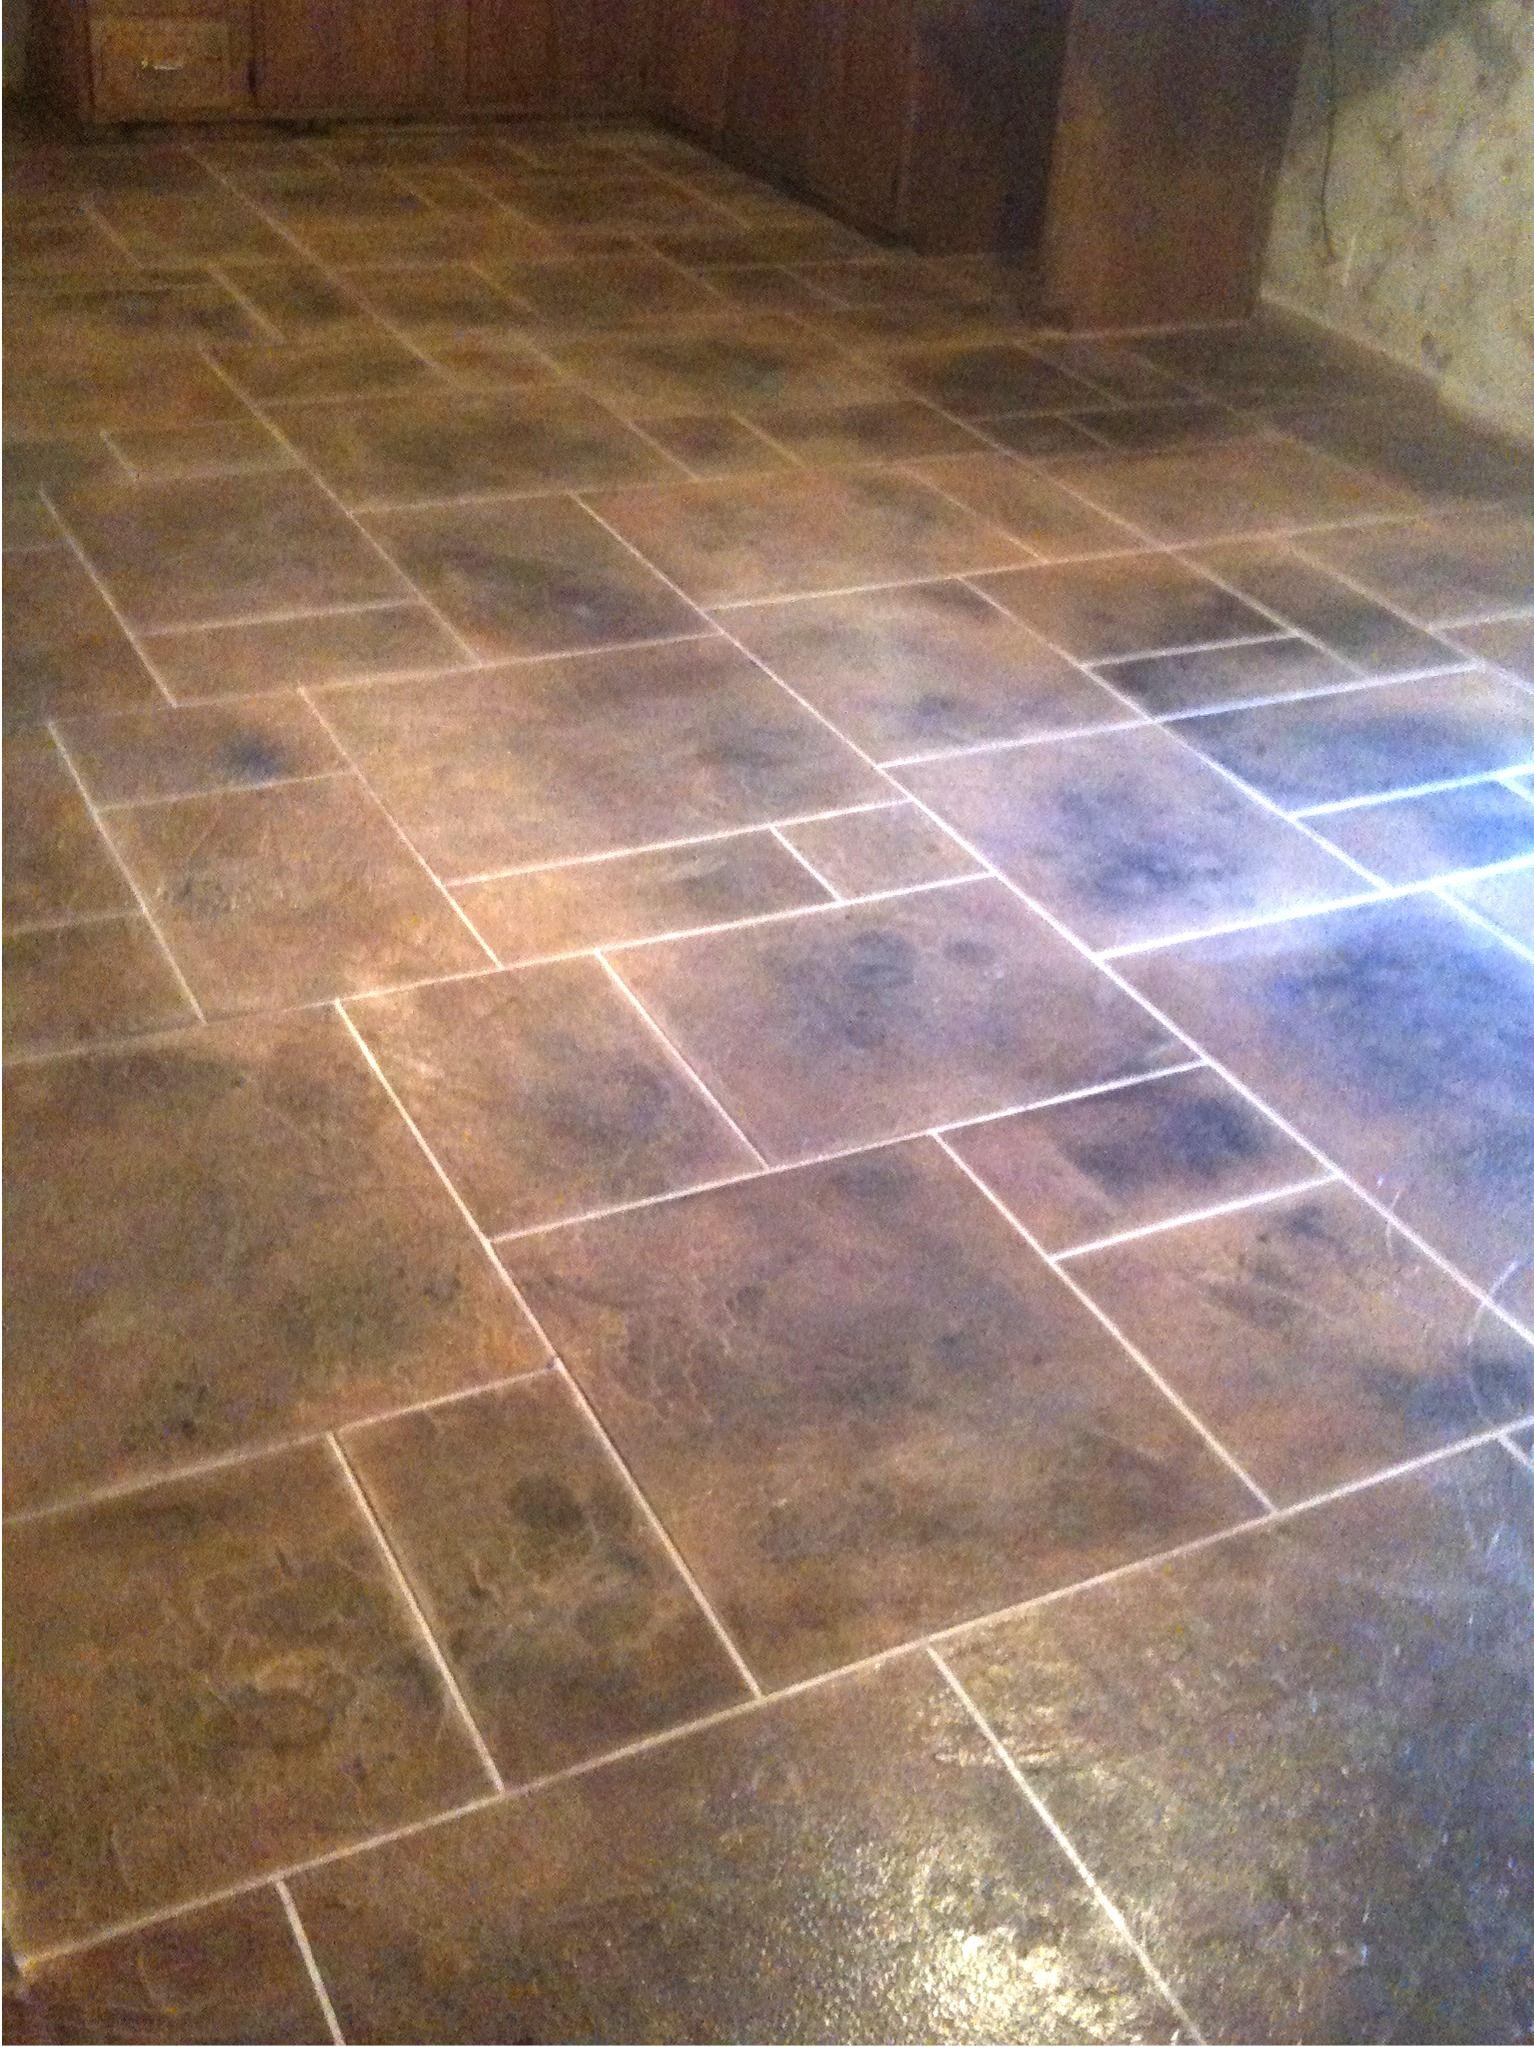 kitchen flooring types Furniture Classic Kitchen Tile Flooring Idea With Multiple Tile Pattern 23 Remarkable Tile Designs And Patterns Idea For Kitchen Floors Design Ideas